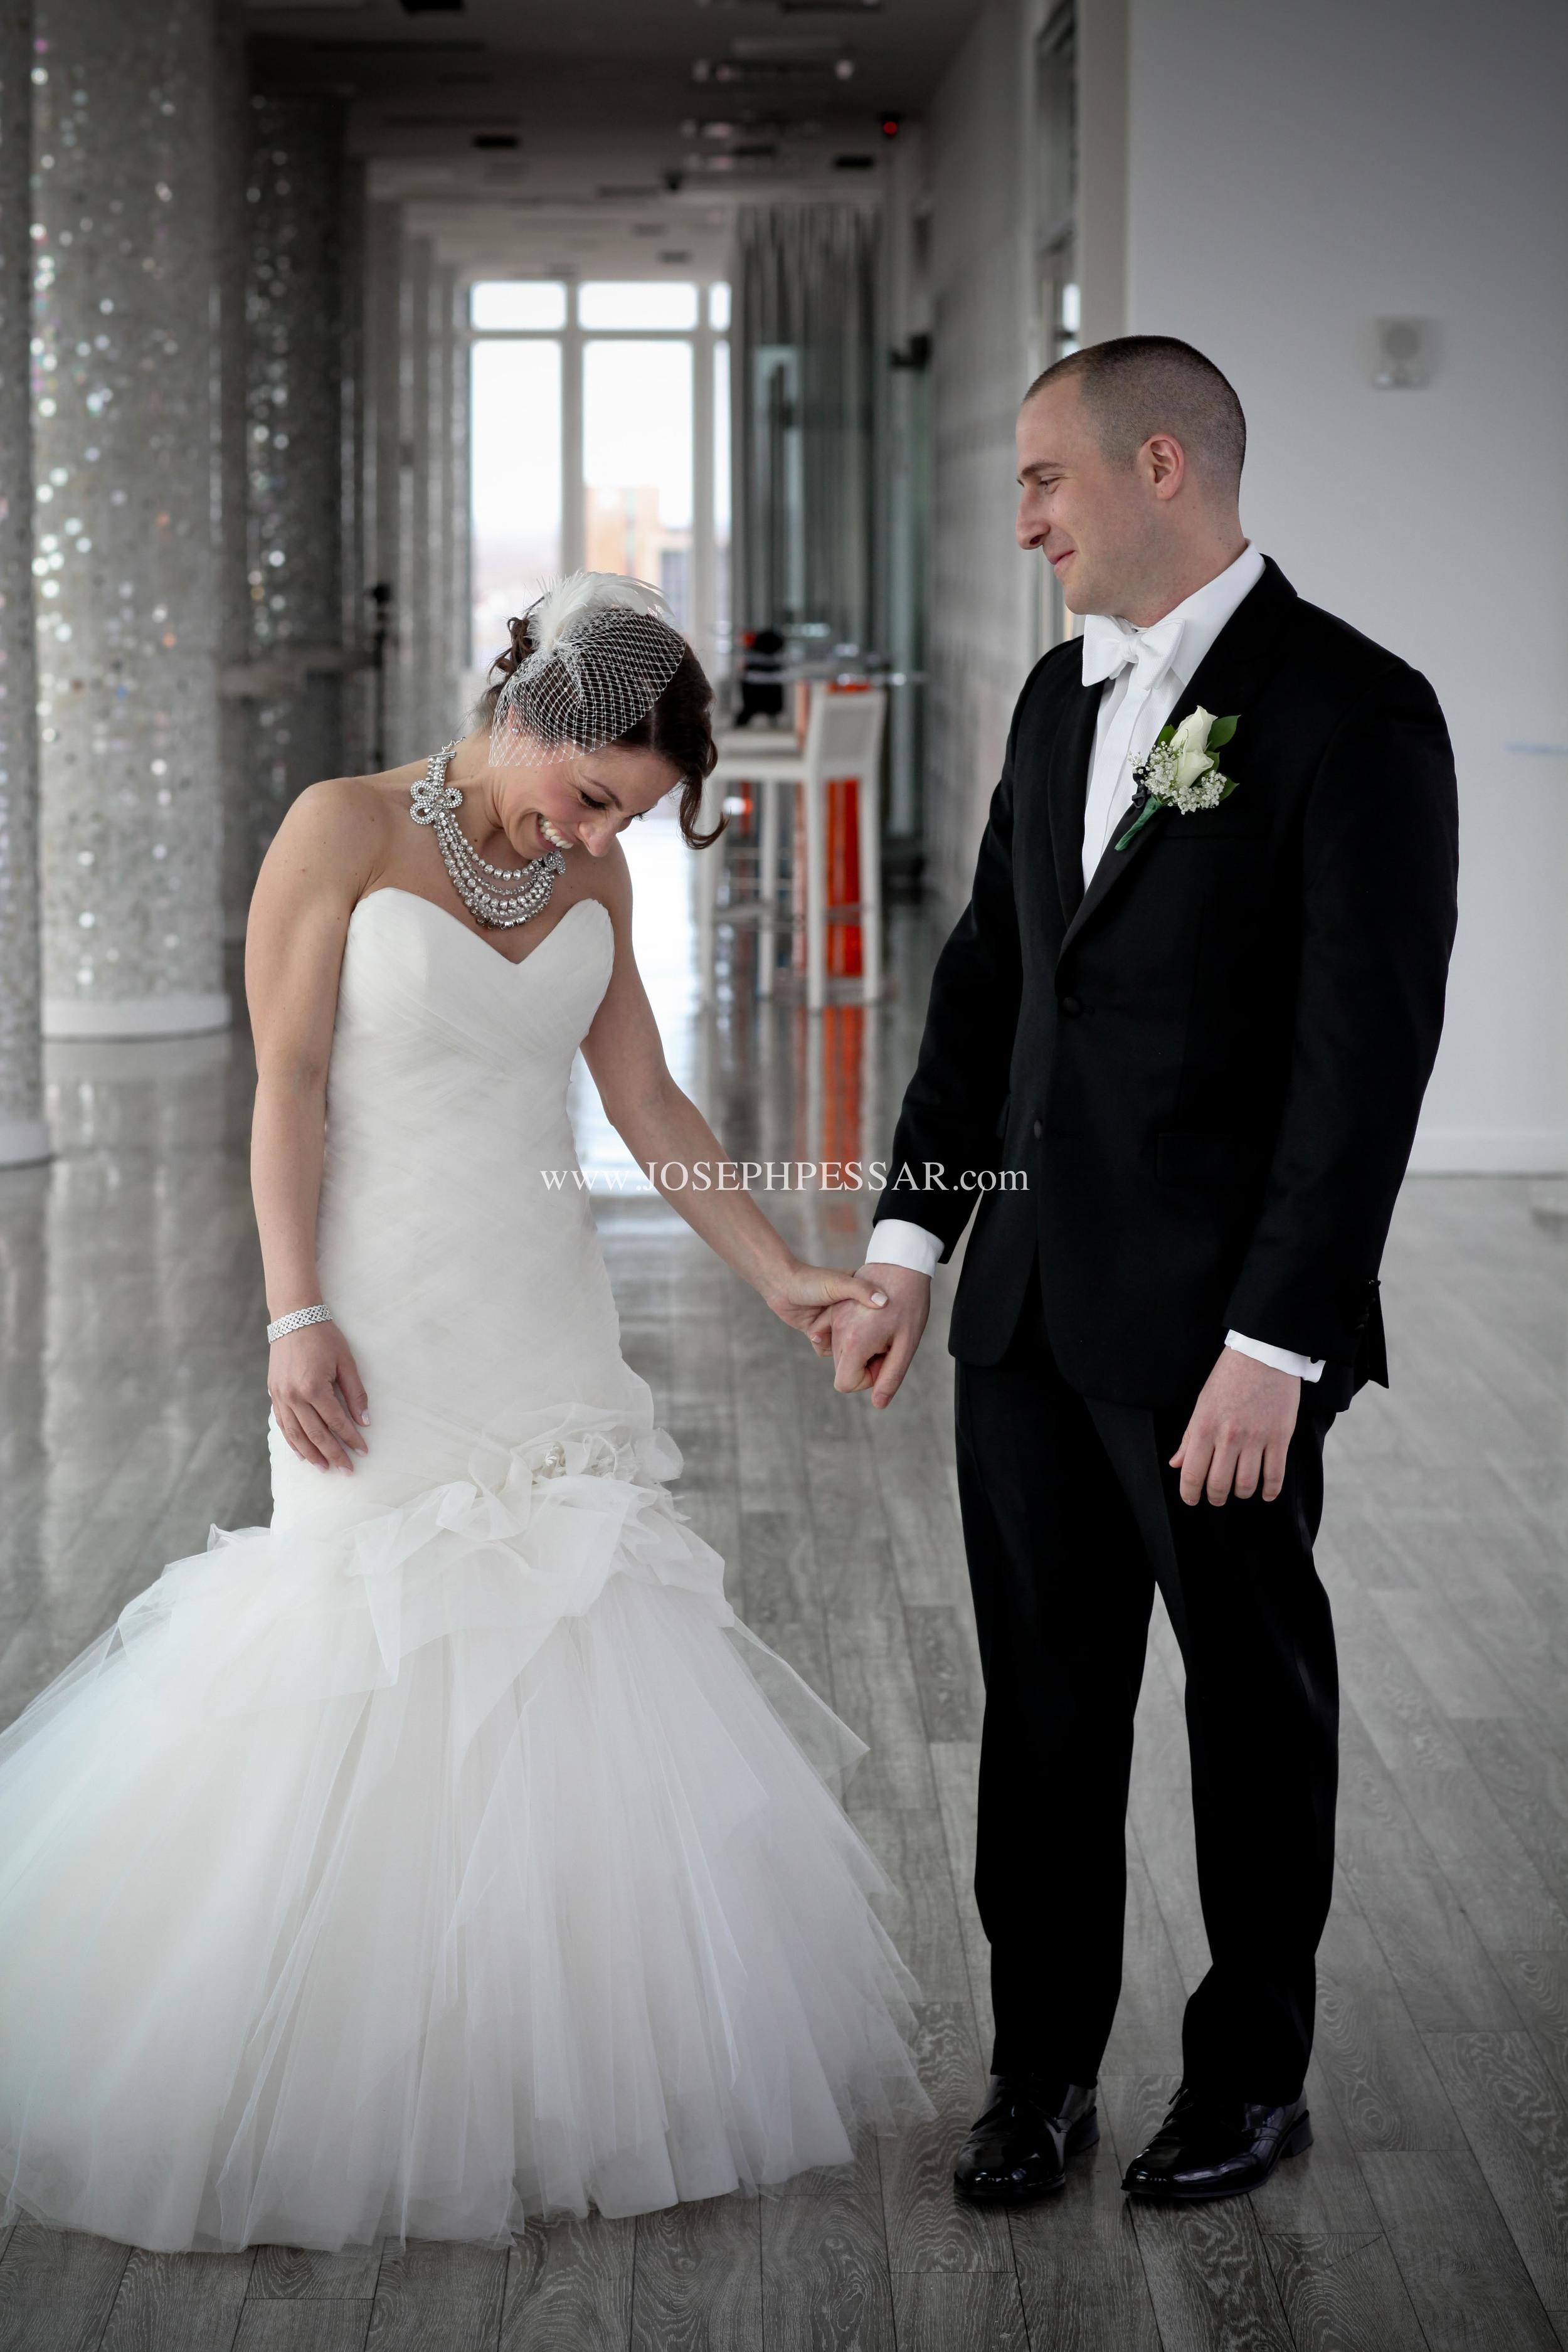 nyc_wedding_photographer0015.jpg